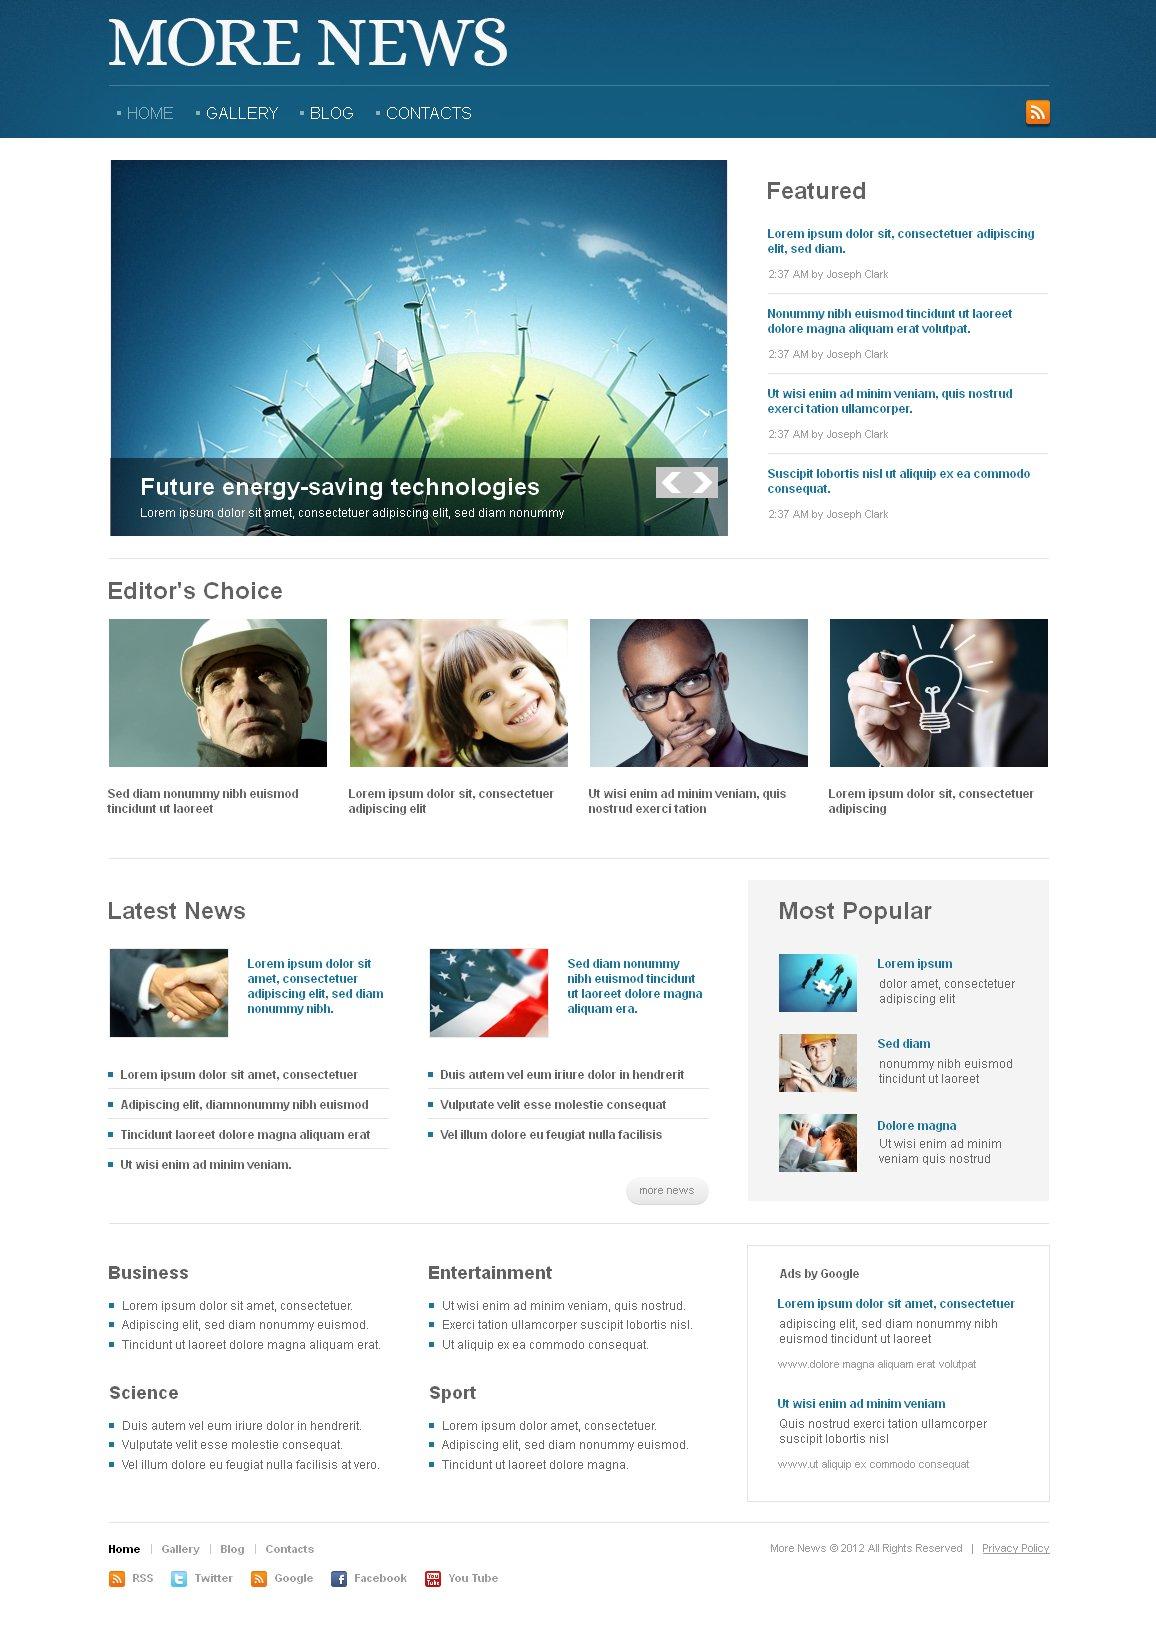 News Portal Moto CMS HTML Template #41456